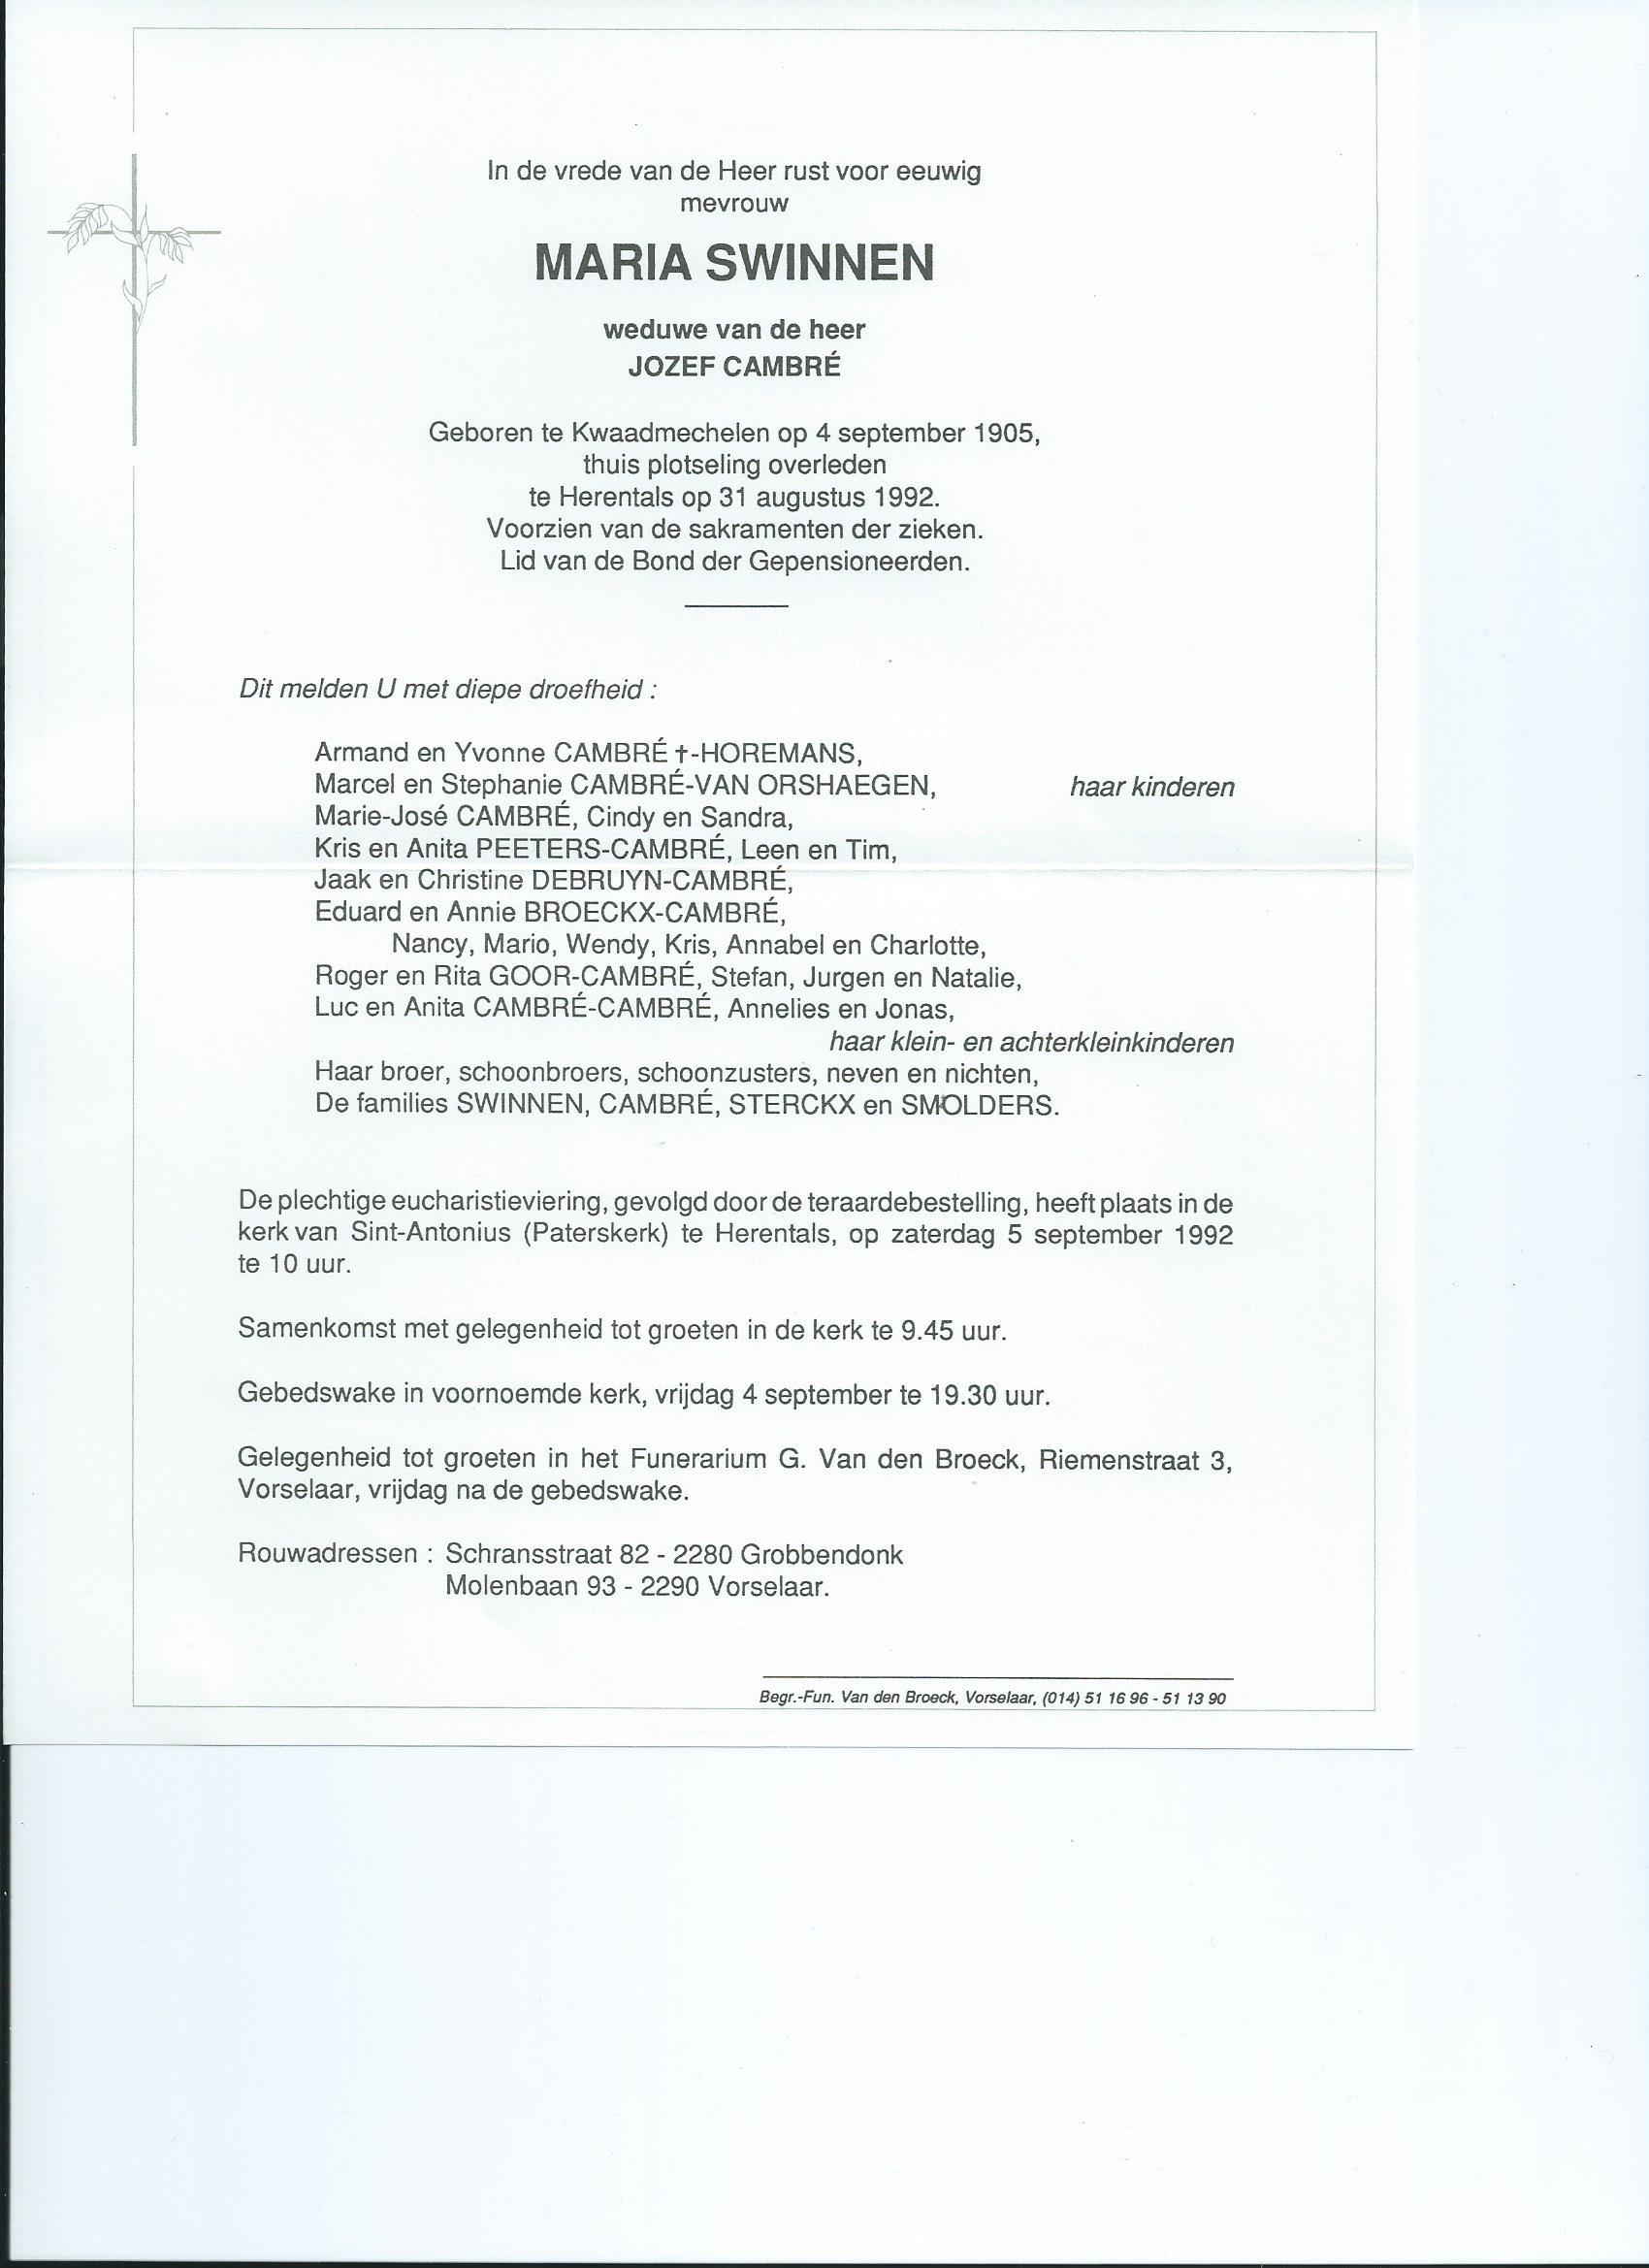 p12217_1700_2338.jpg